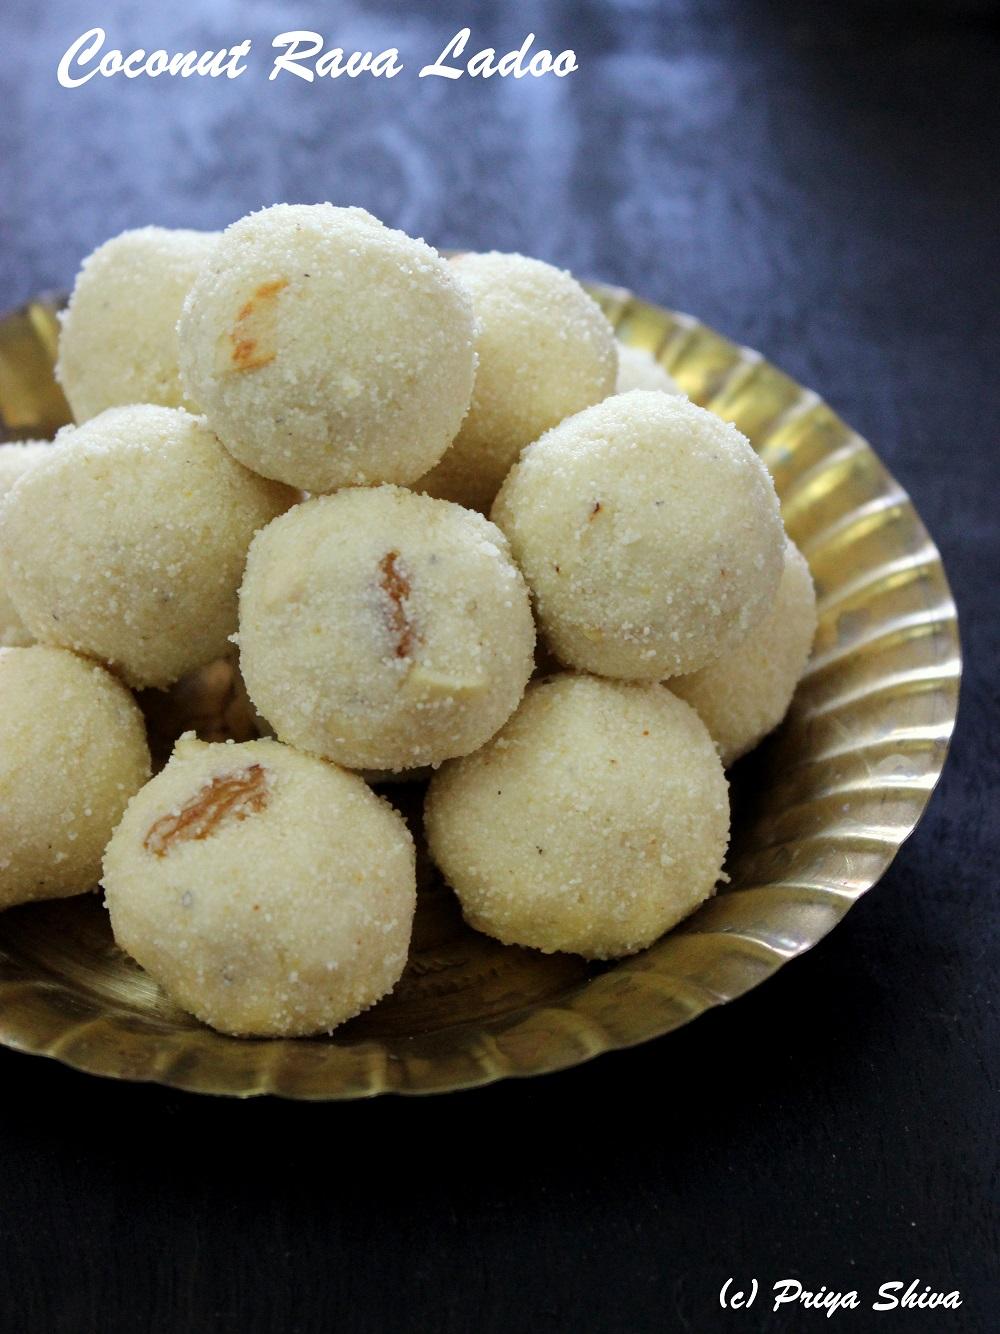 Rava ladoo recipe rava laddu recipe sooji laddu or sooji ladoo